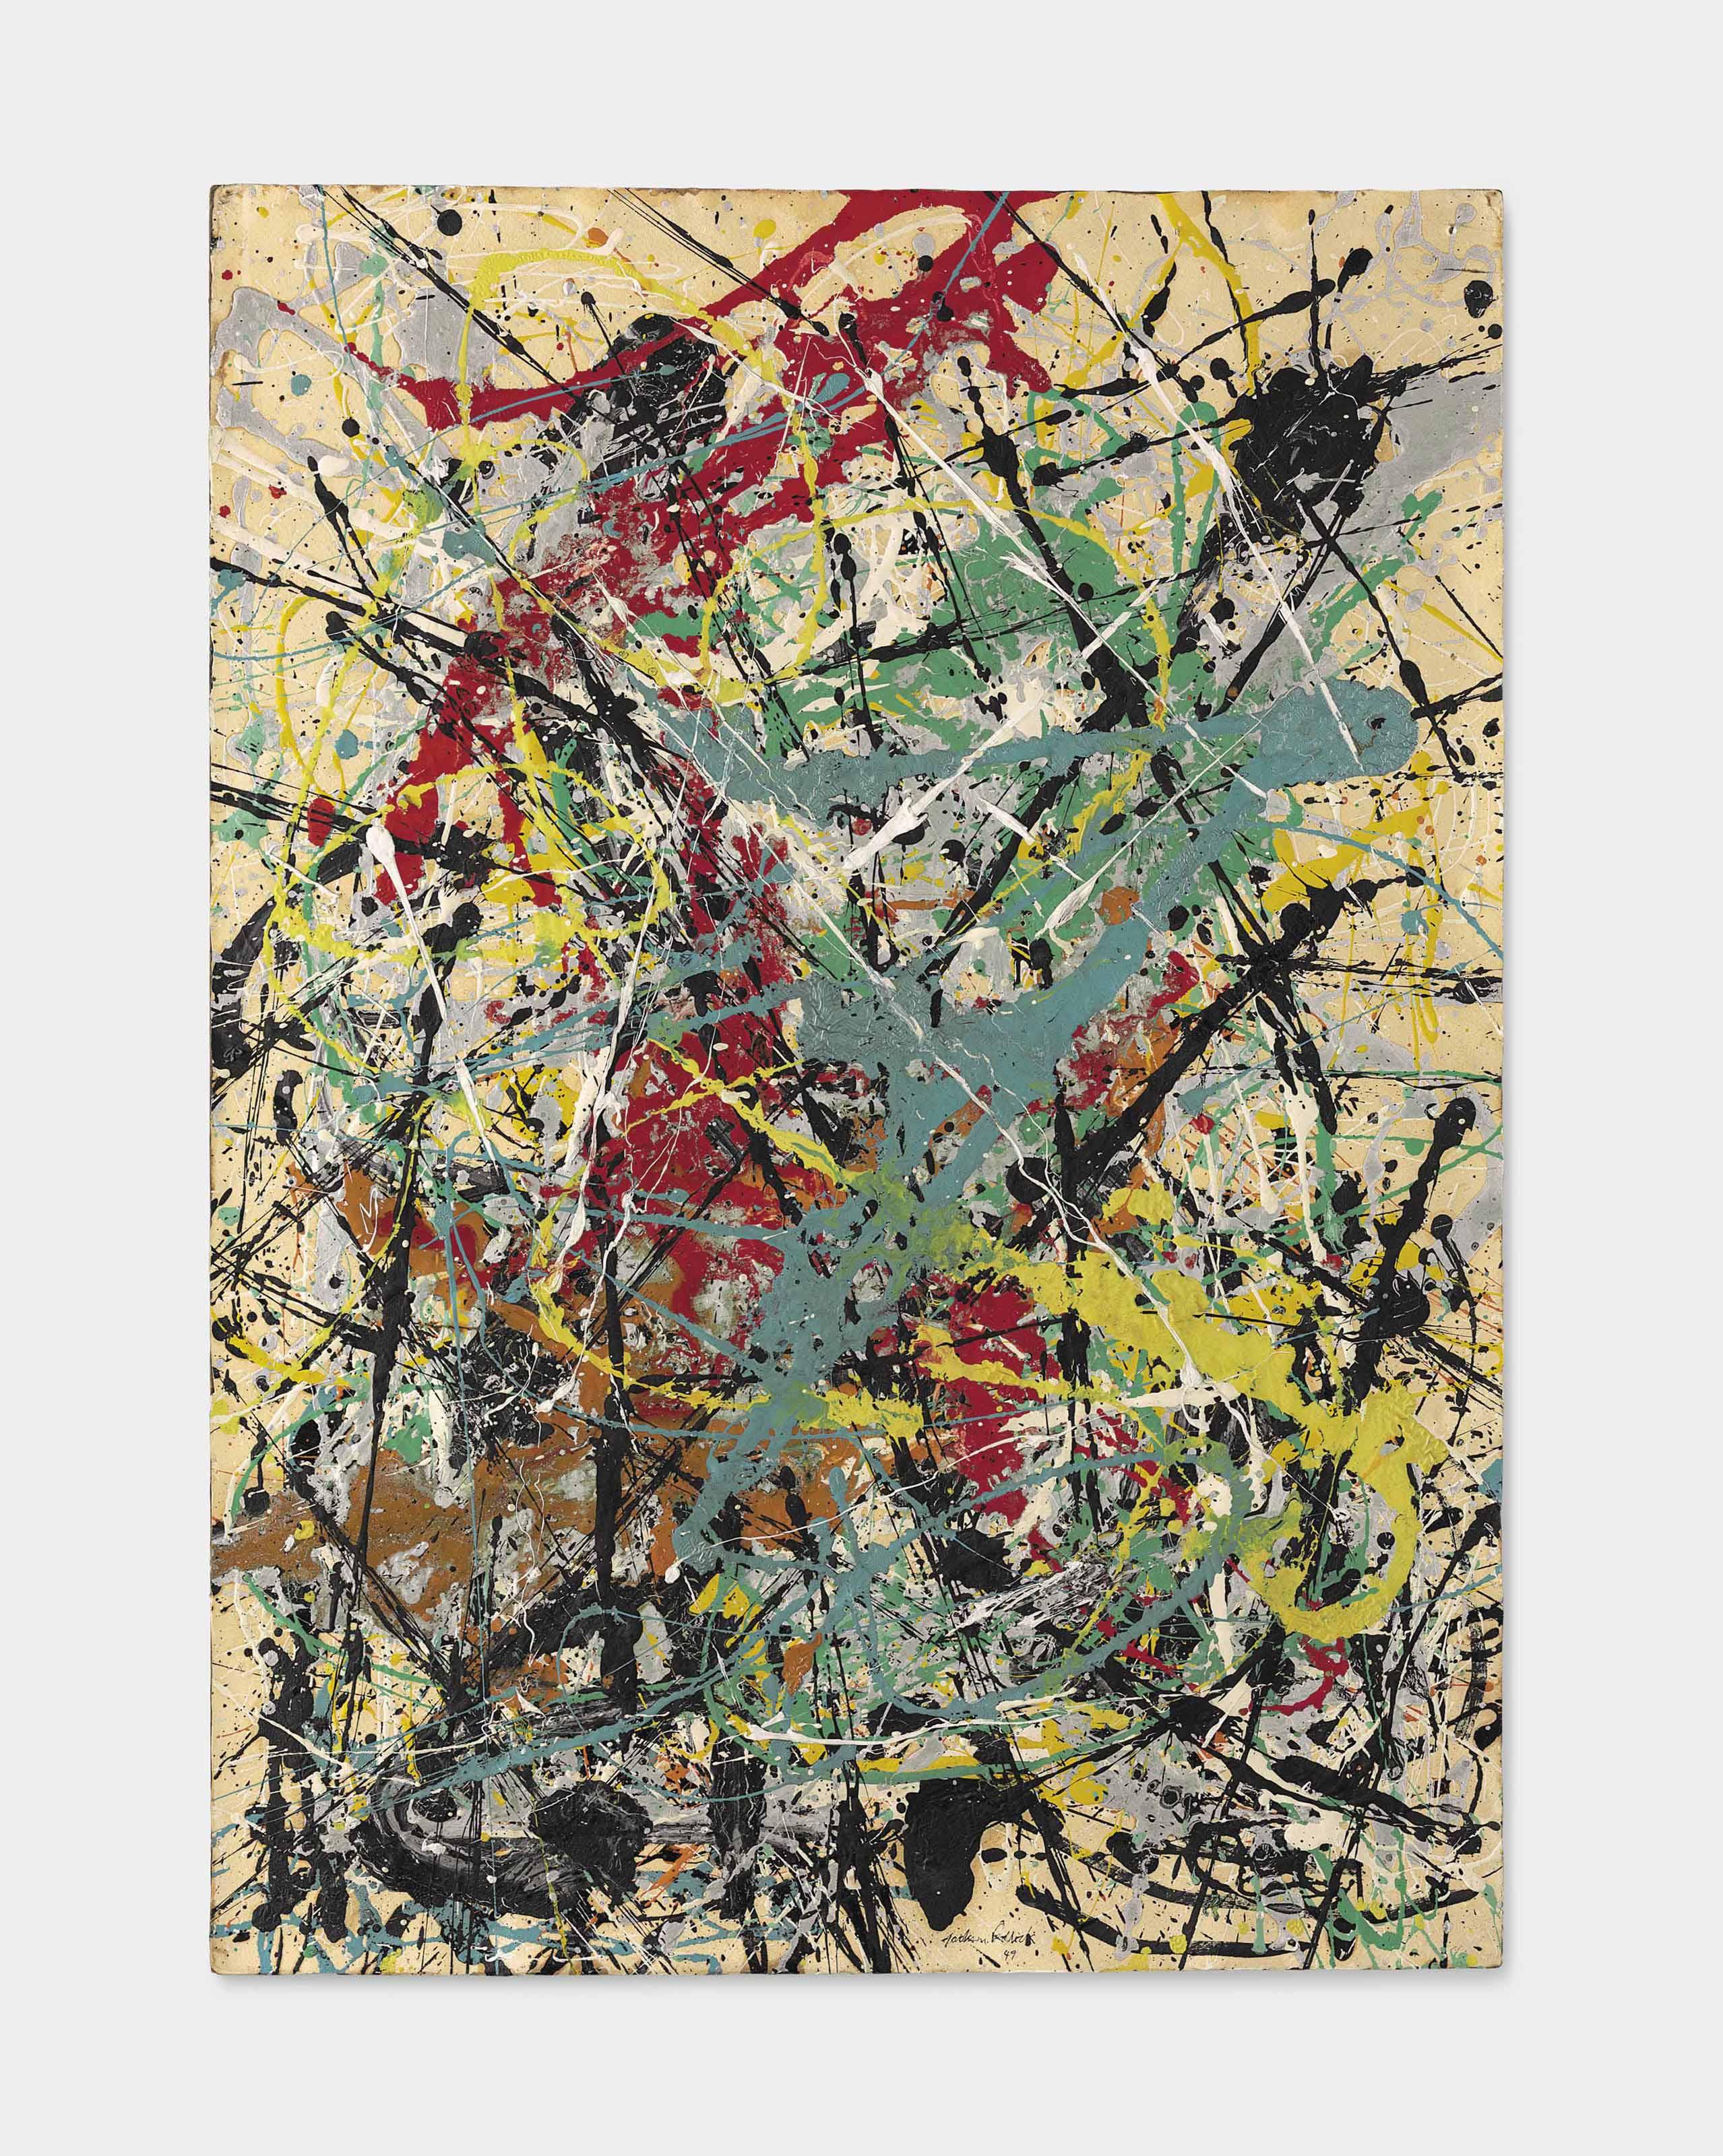 Audio: Jackson Pollock, Number 16, 1949